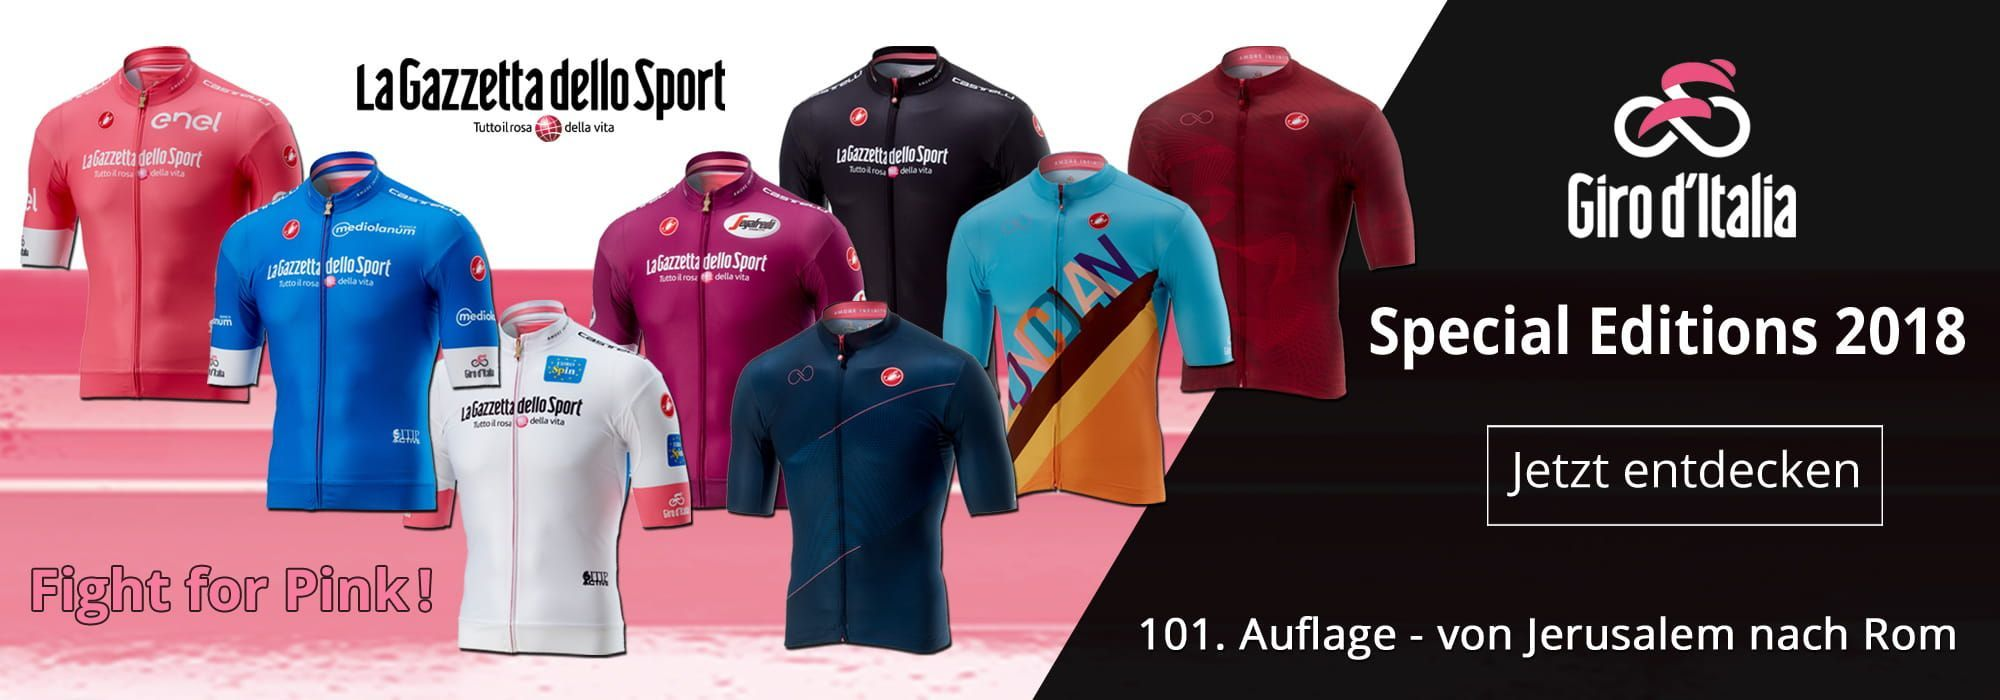 Limitierte Giro d'Italia 2018 Special Editions